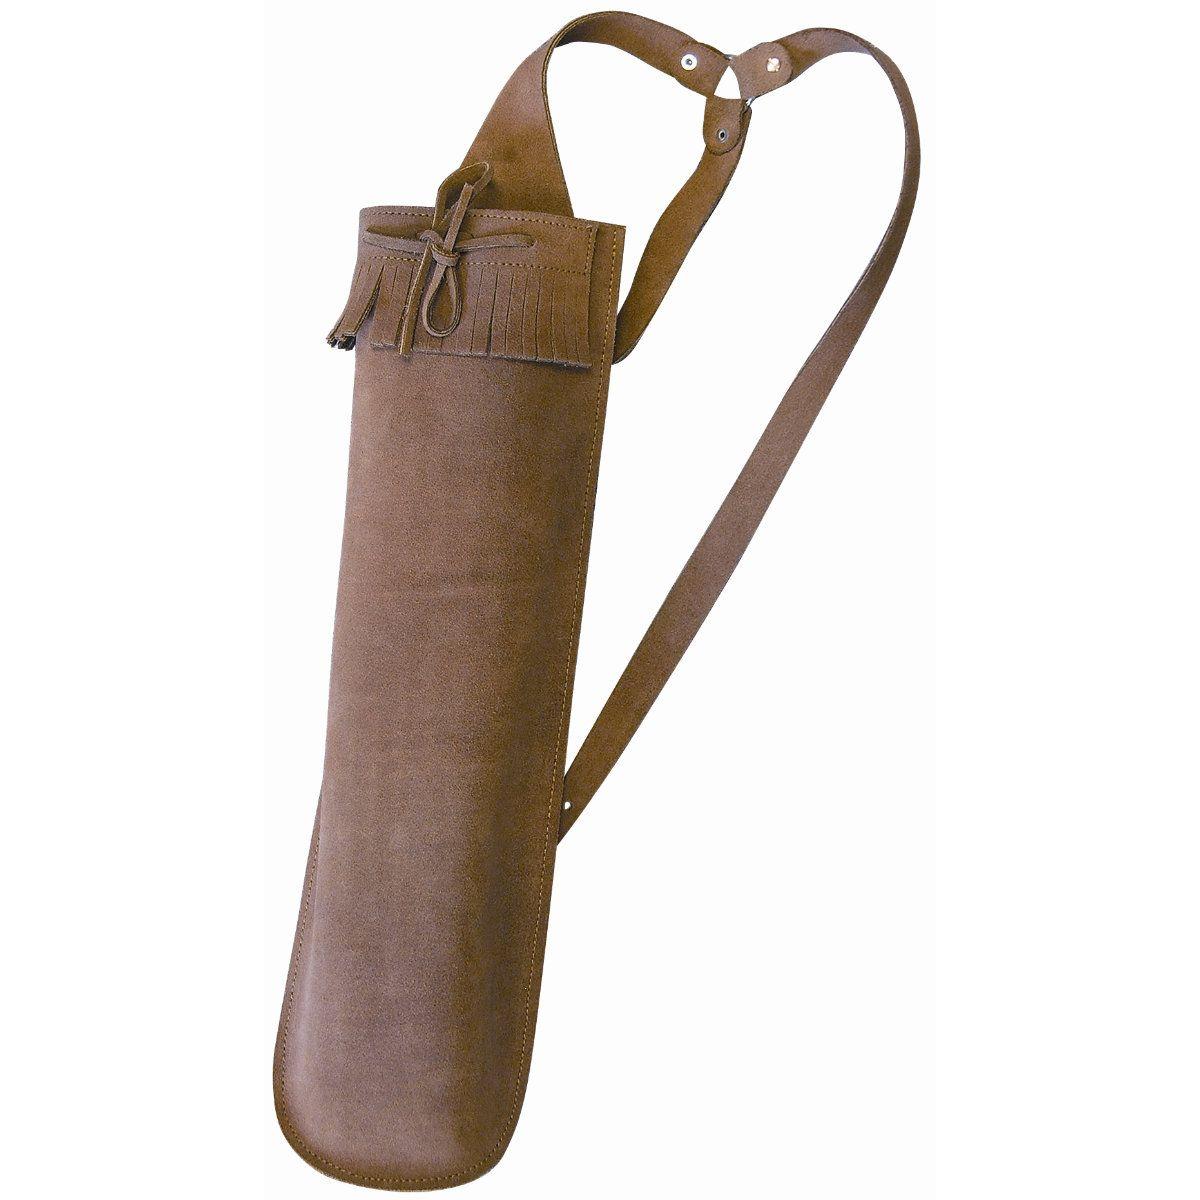 Vista Raider Leather Back Quiver-720465 - Gander Mountain